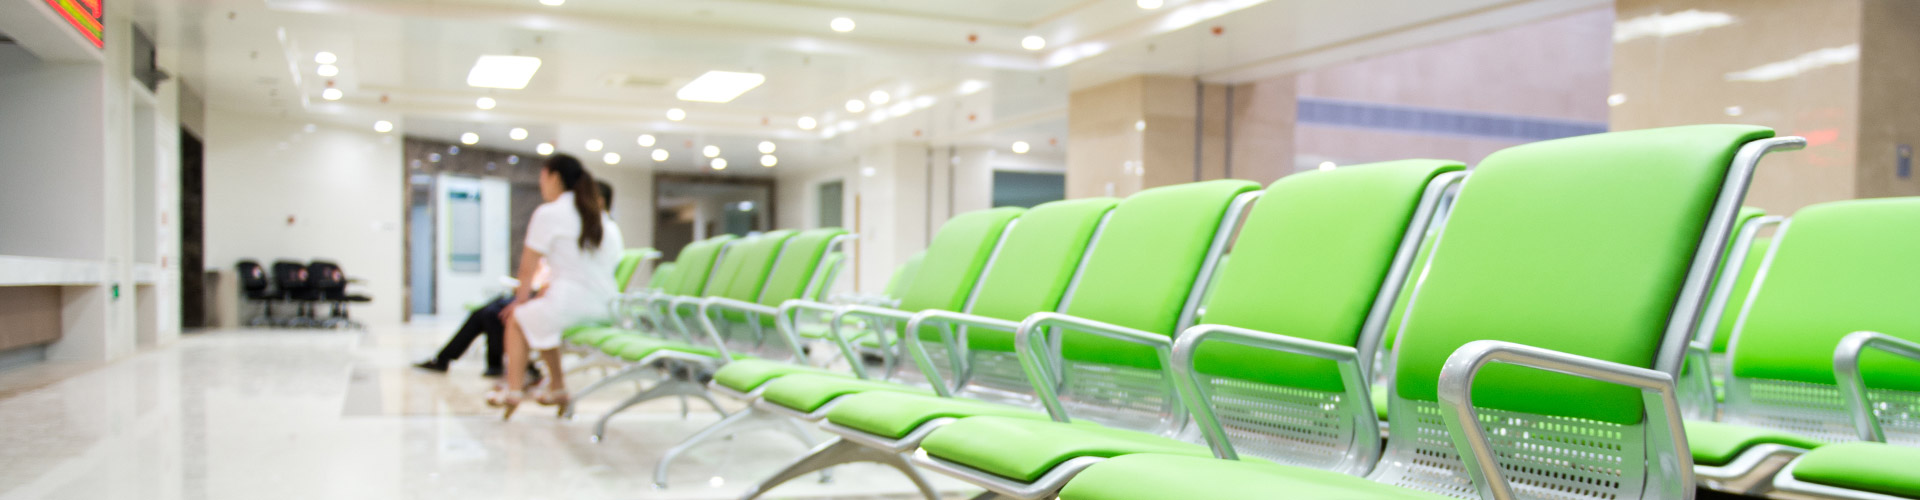 aroh-health-centres-header-image